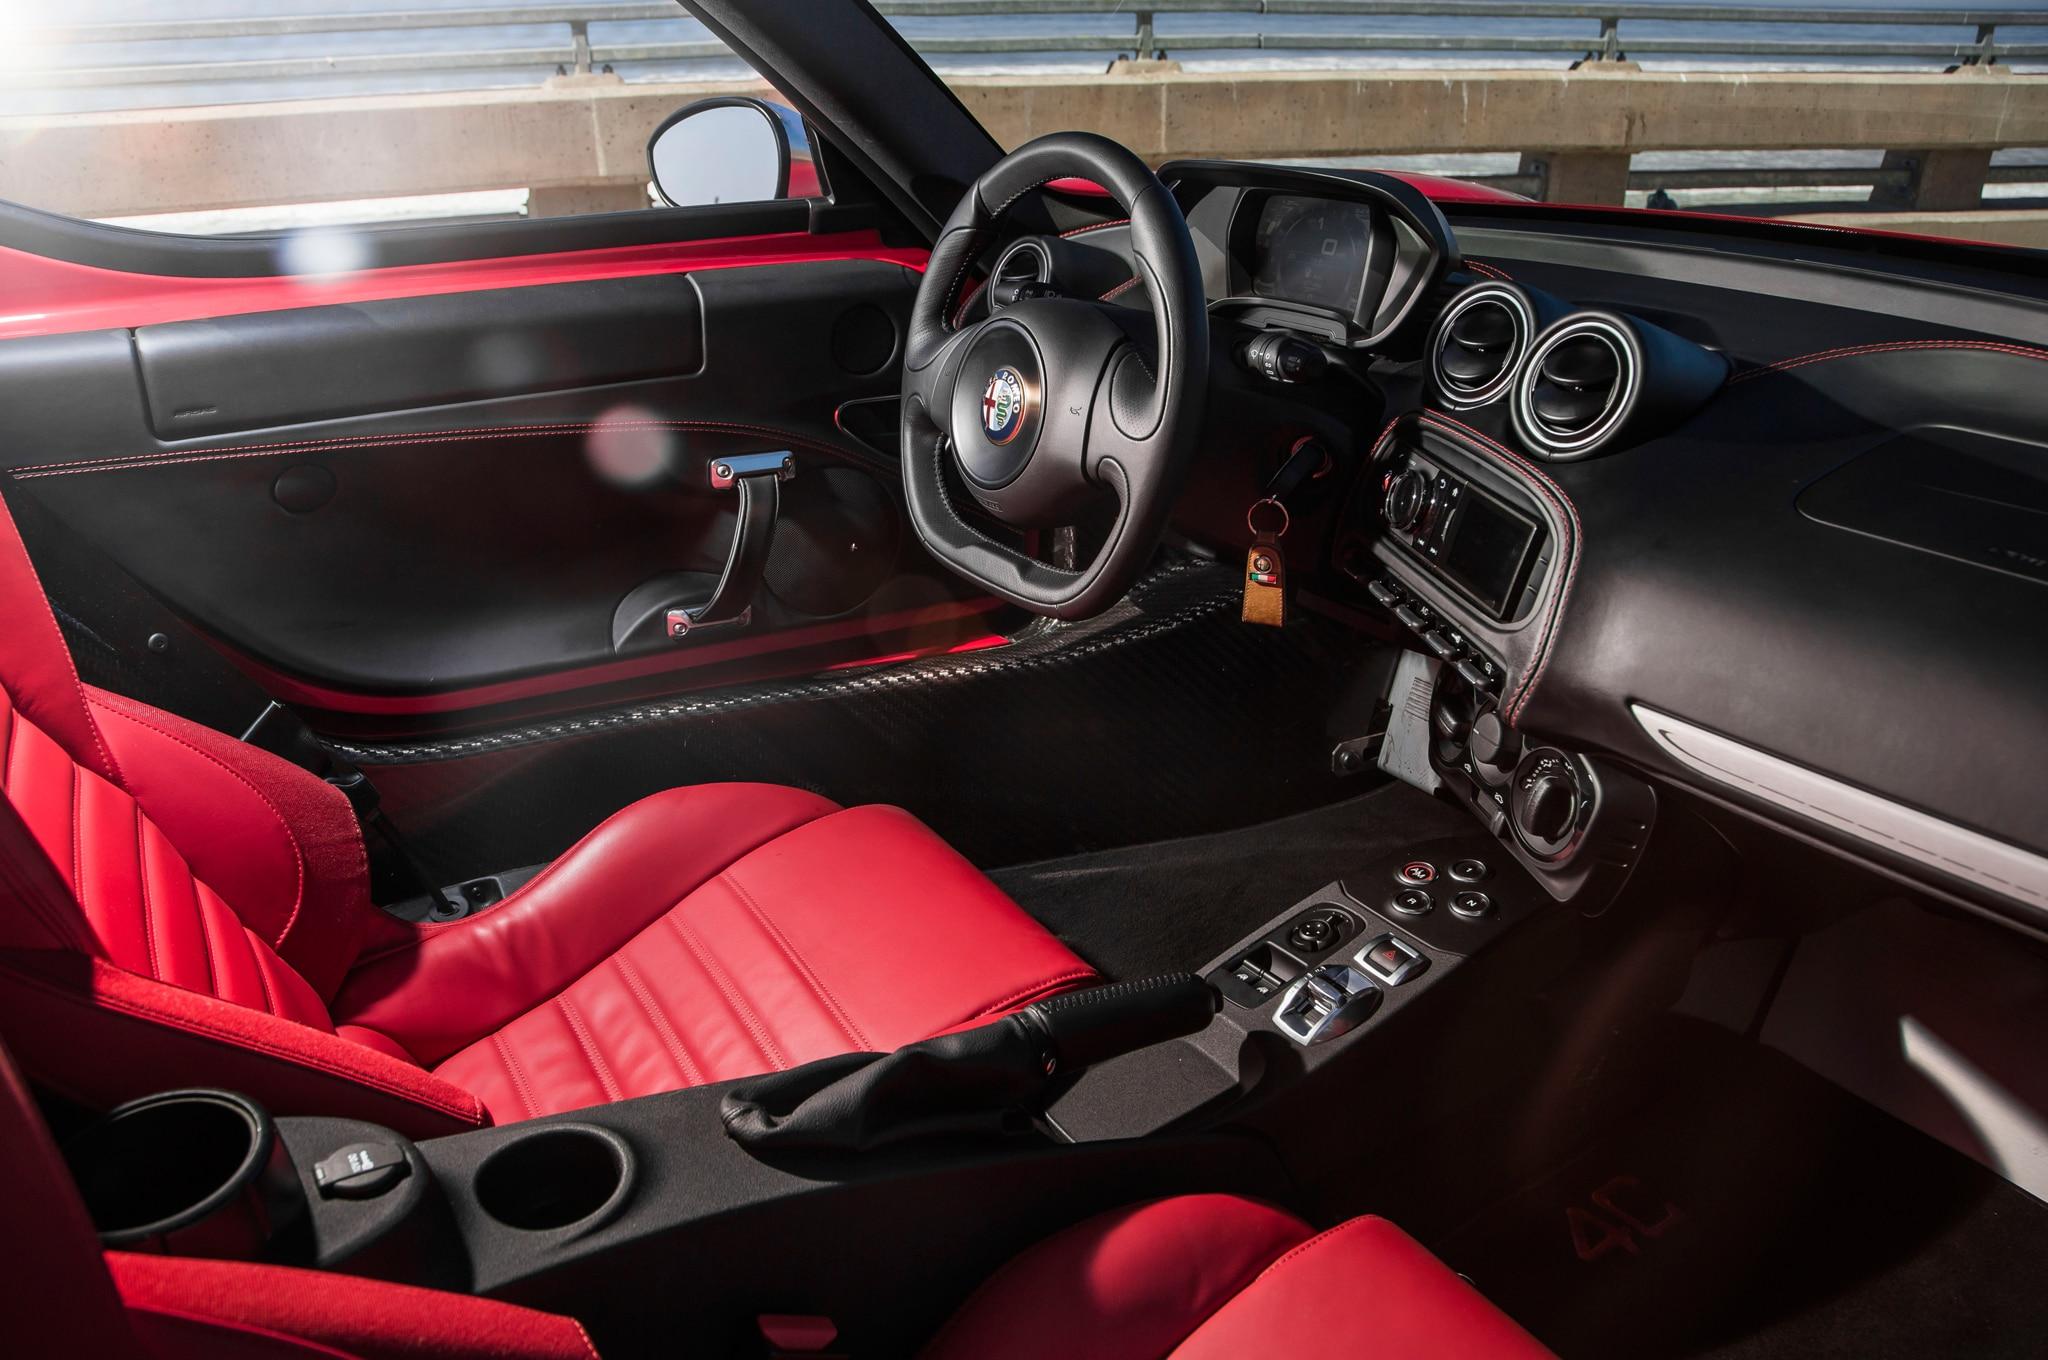 2015-Alfa-Romeo-4C-cockpit-02.jpg